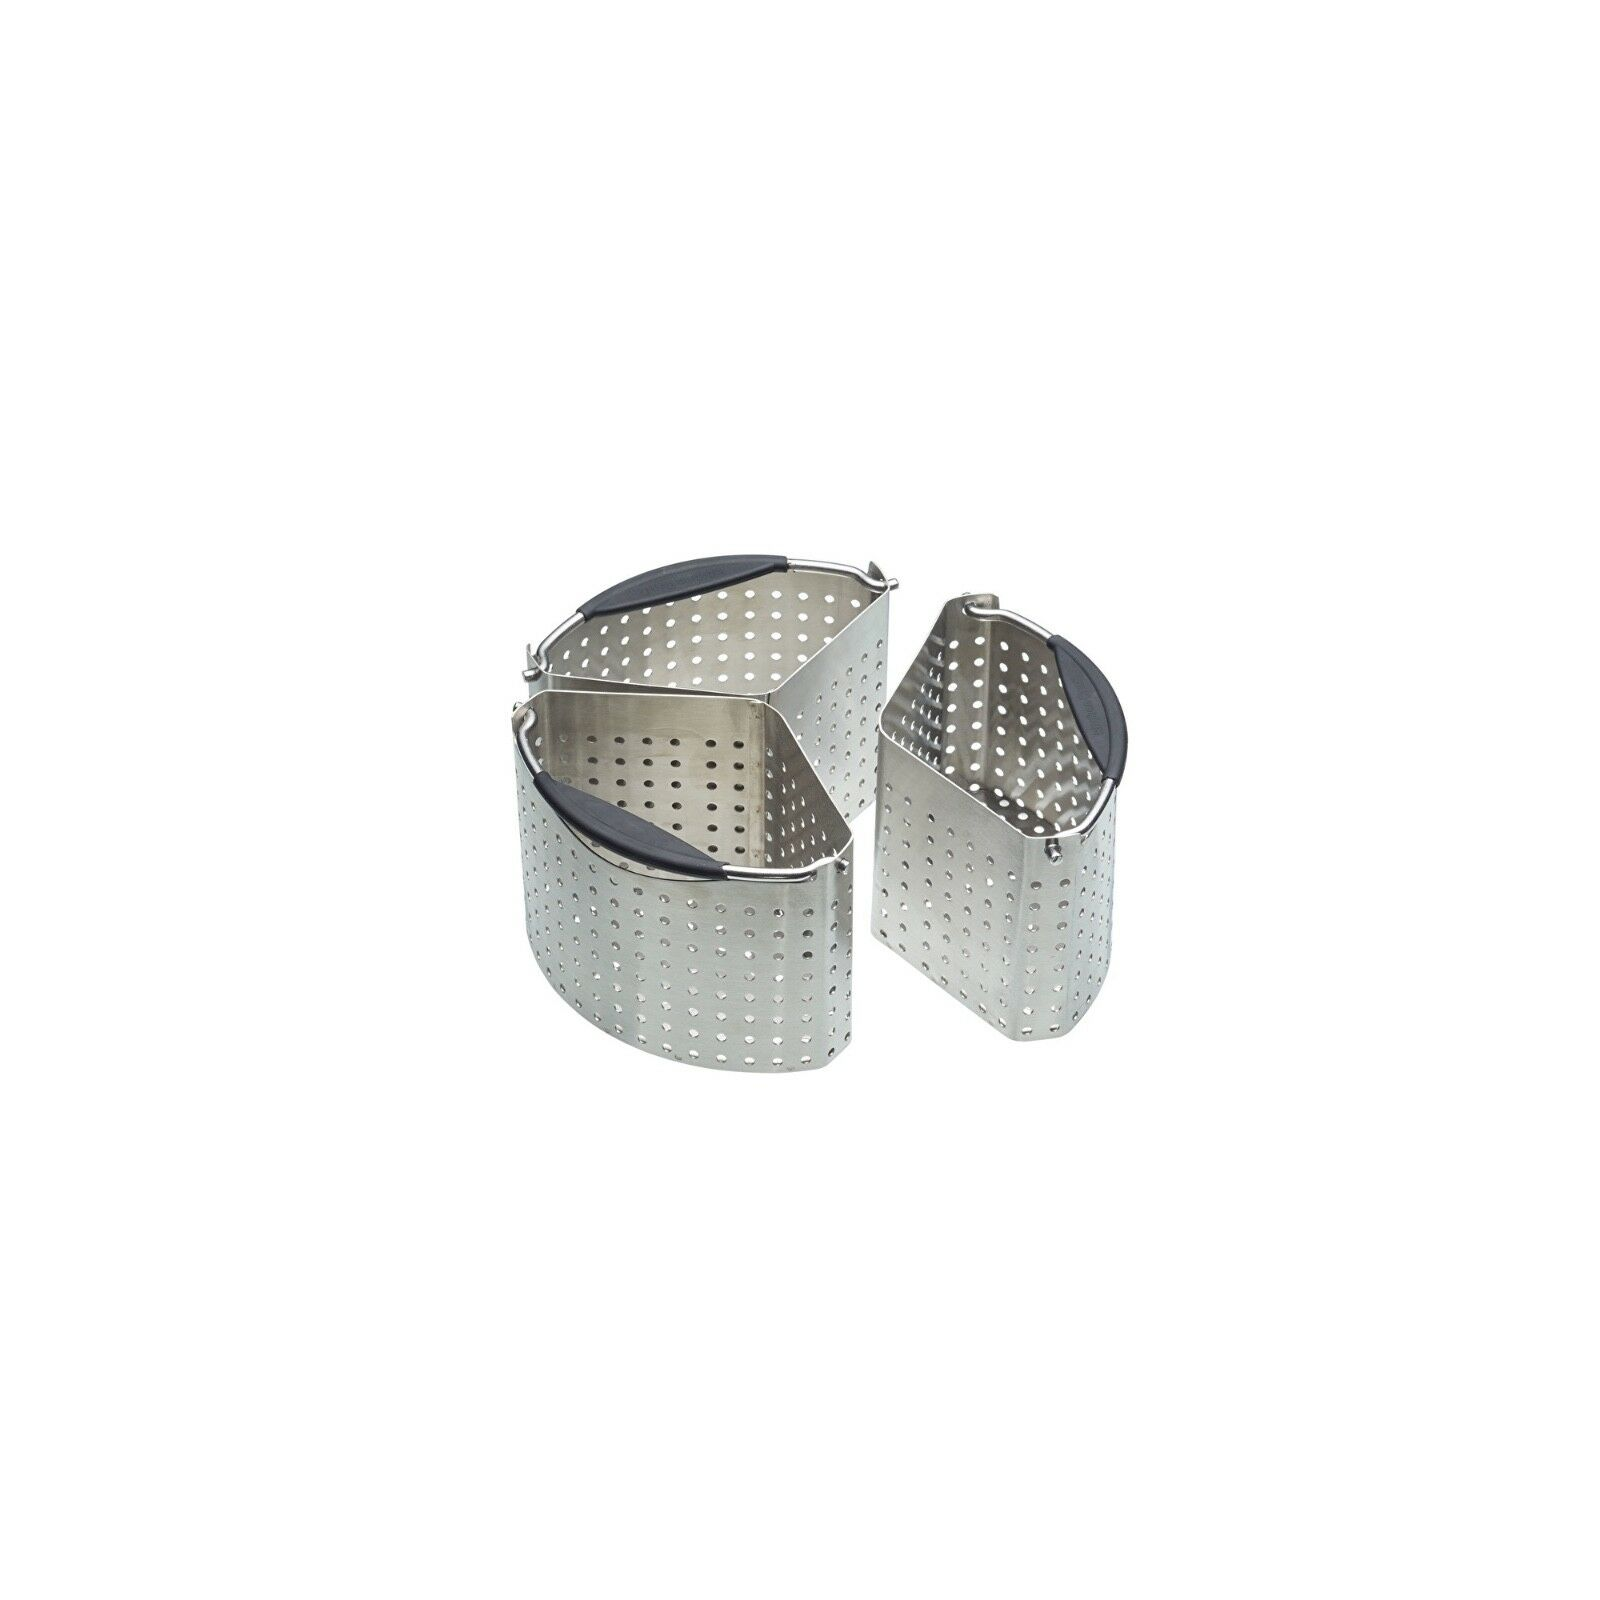 MasterClass kitchencraft Stainless Steel Set of 3 Saucepan Divider Baskets